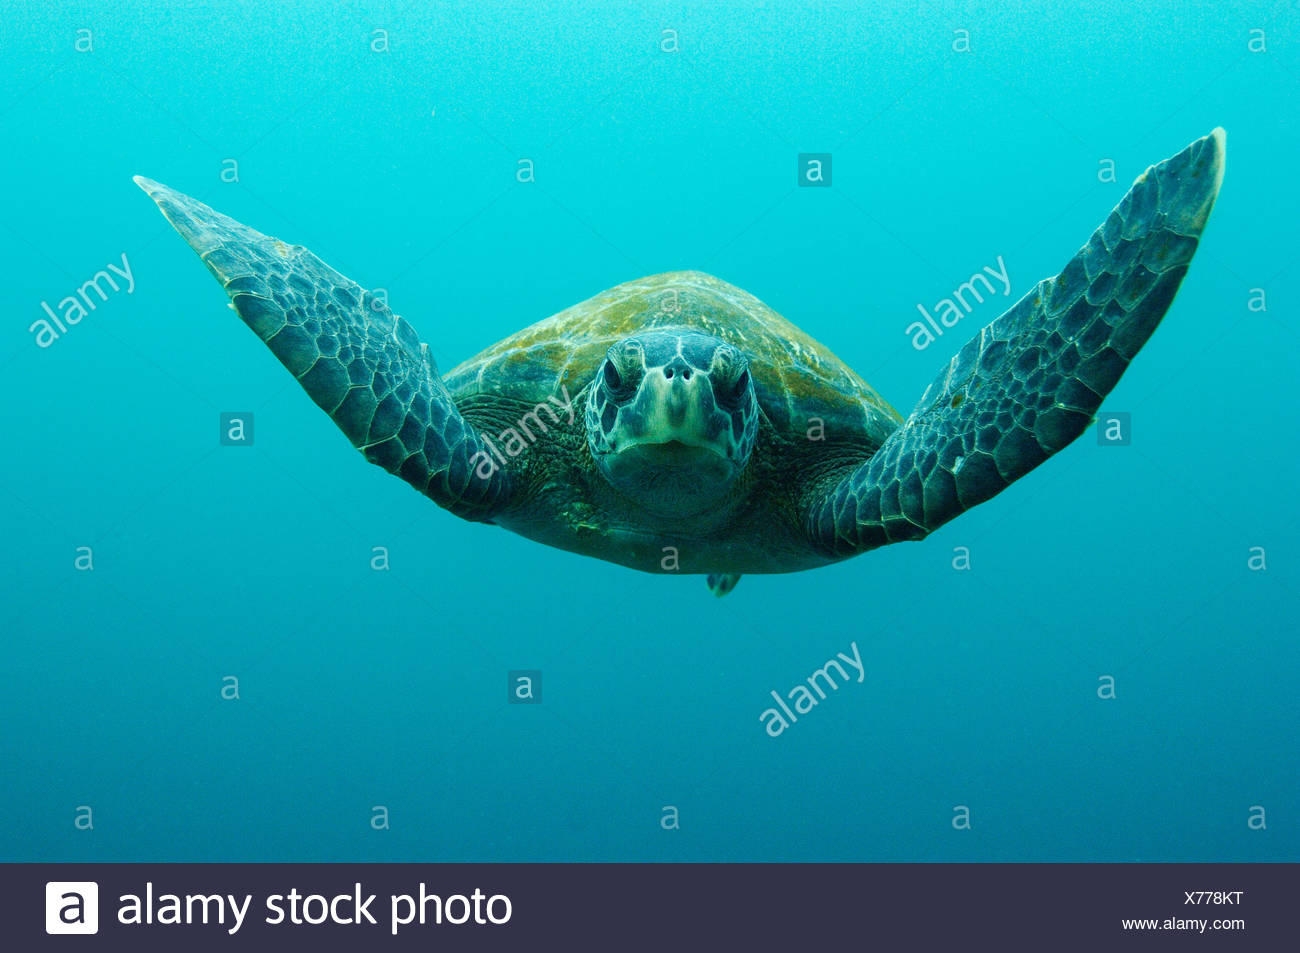 Green Turtle, Central Isles, Galapagos Islands, Ecuador, South America. - Stock Image